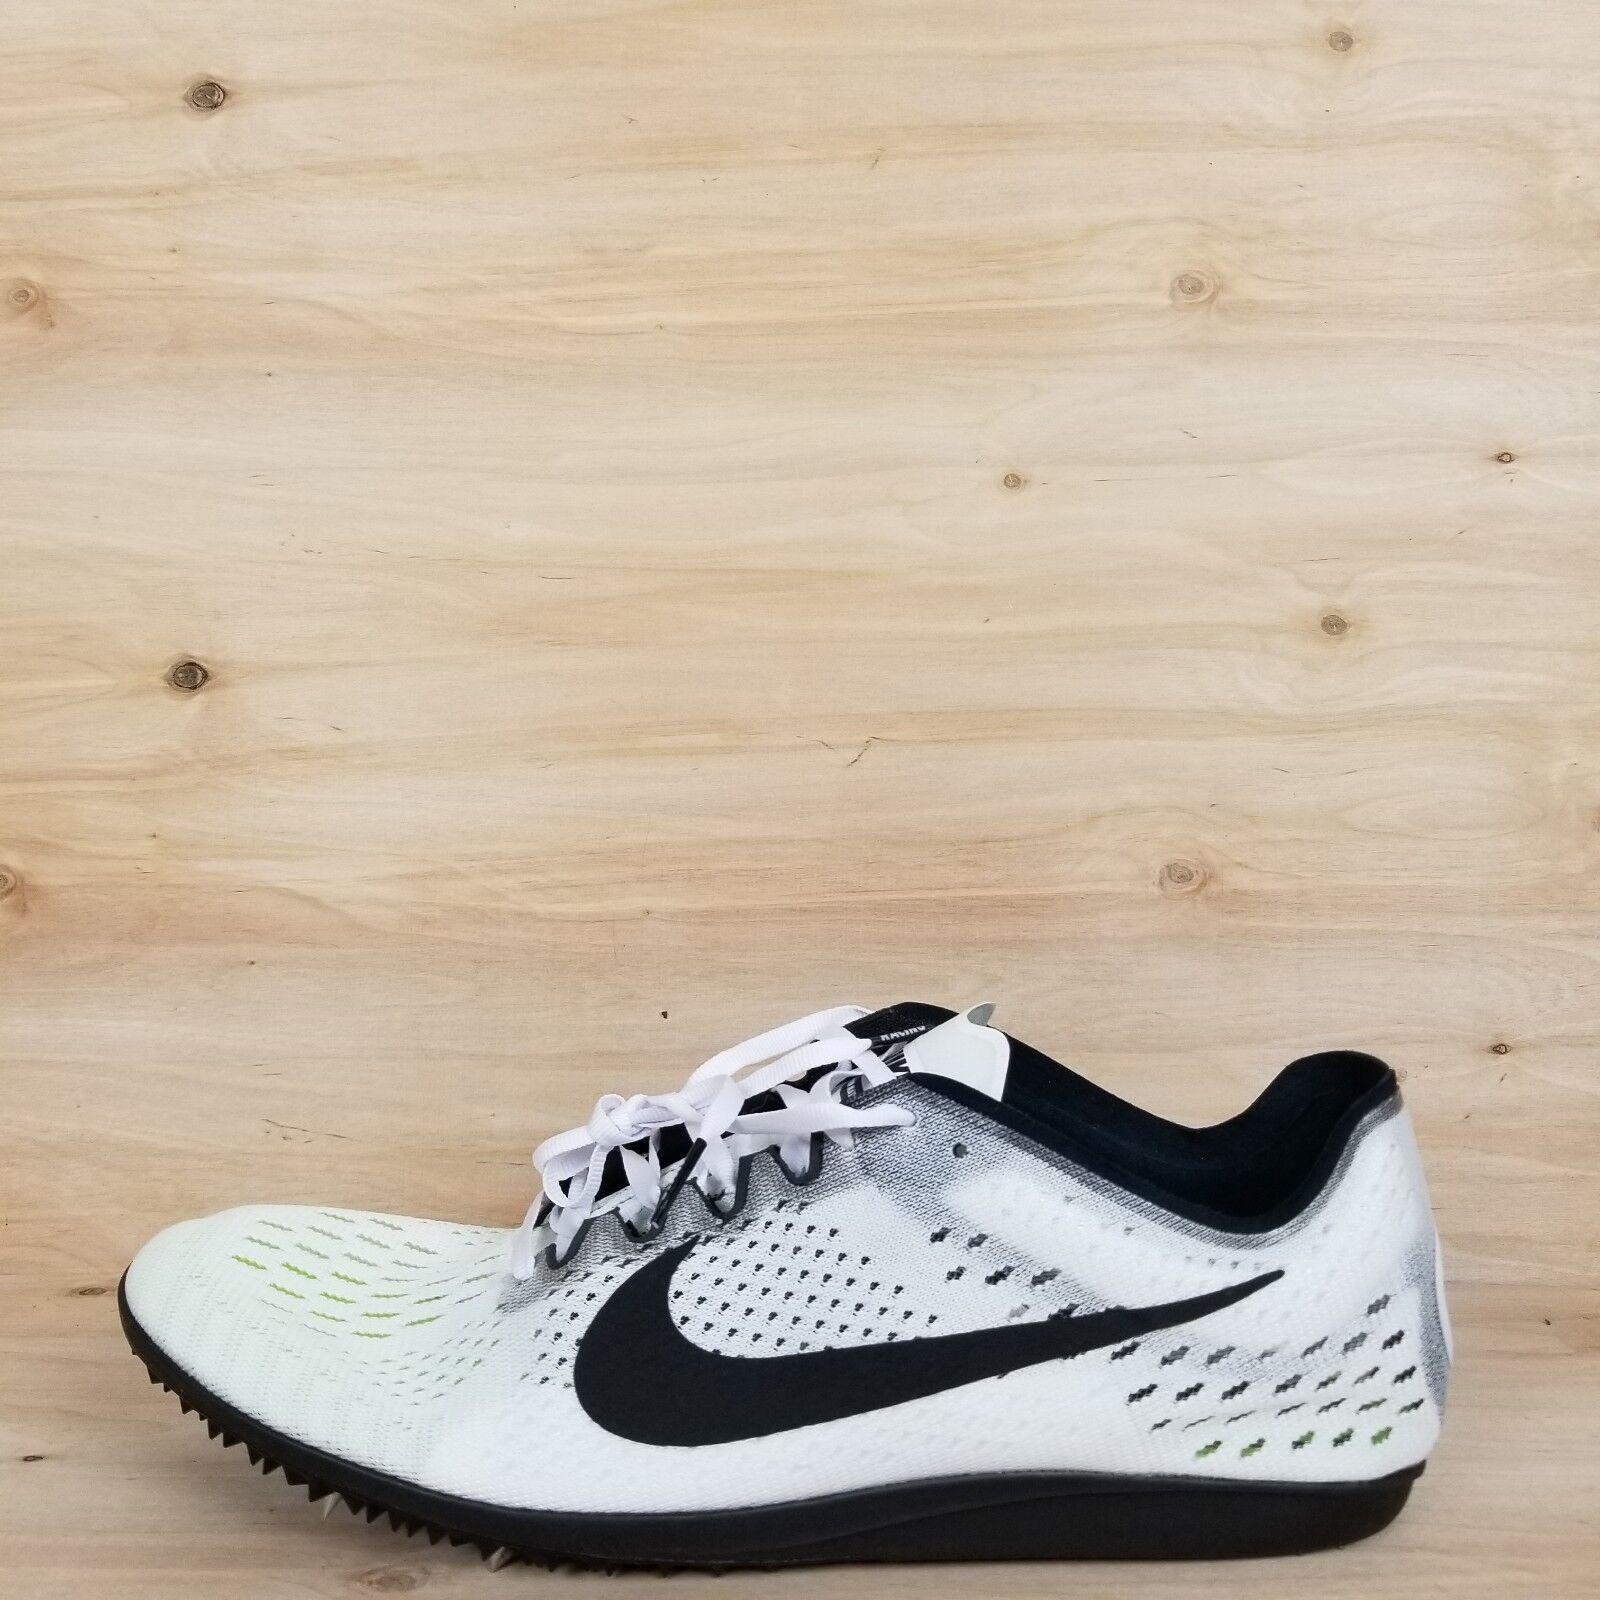 Nike shox nz taglia 12 di pelle nera, poi bianco logo Uomo